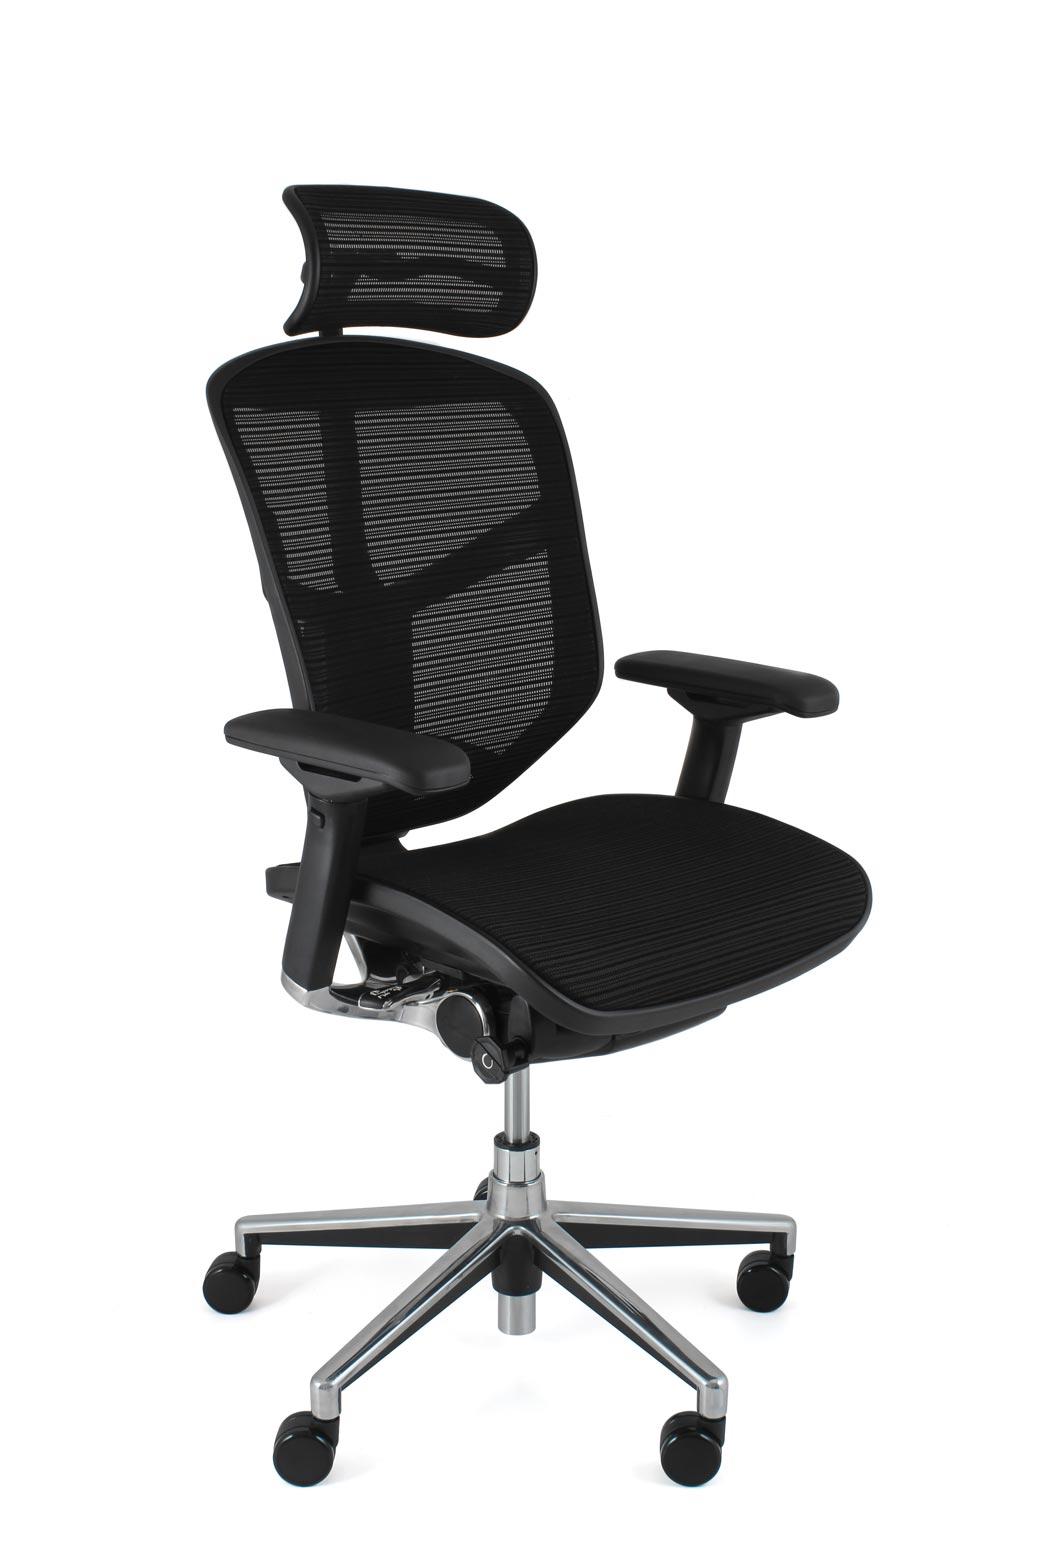 Enjoy Mesh Office Chair